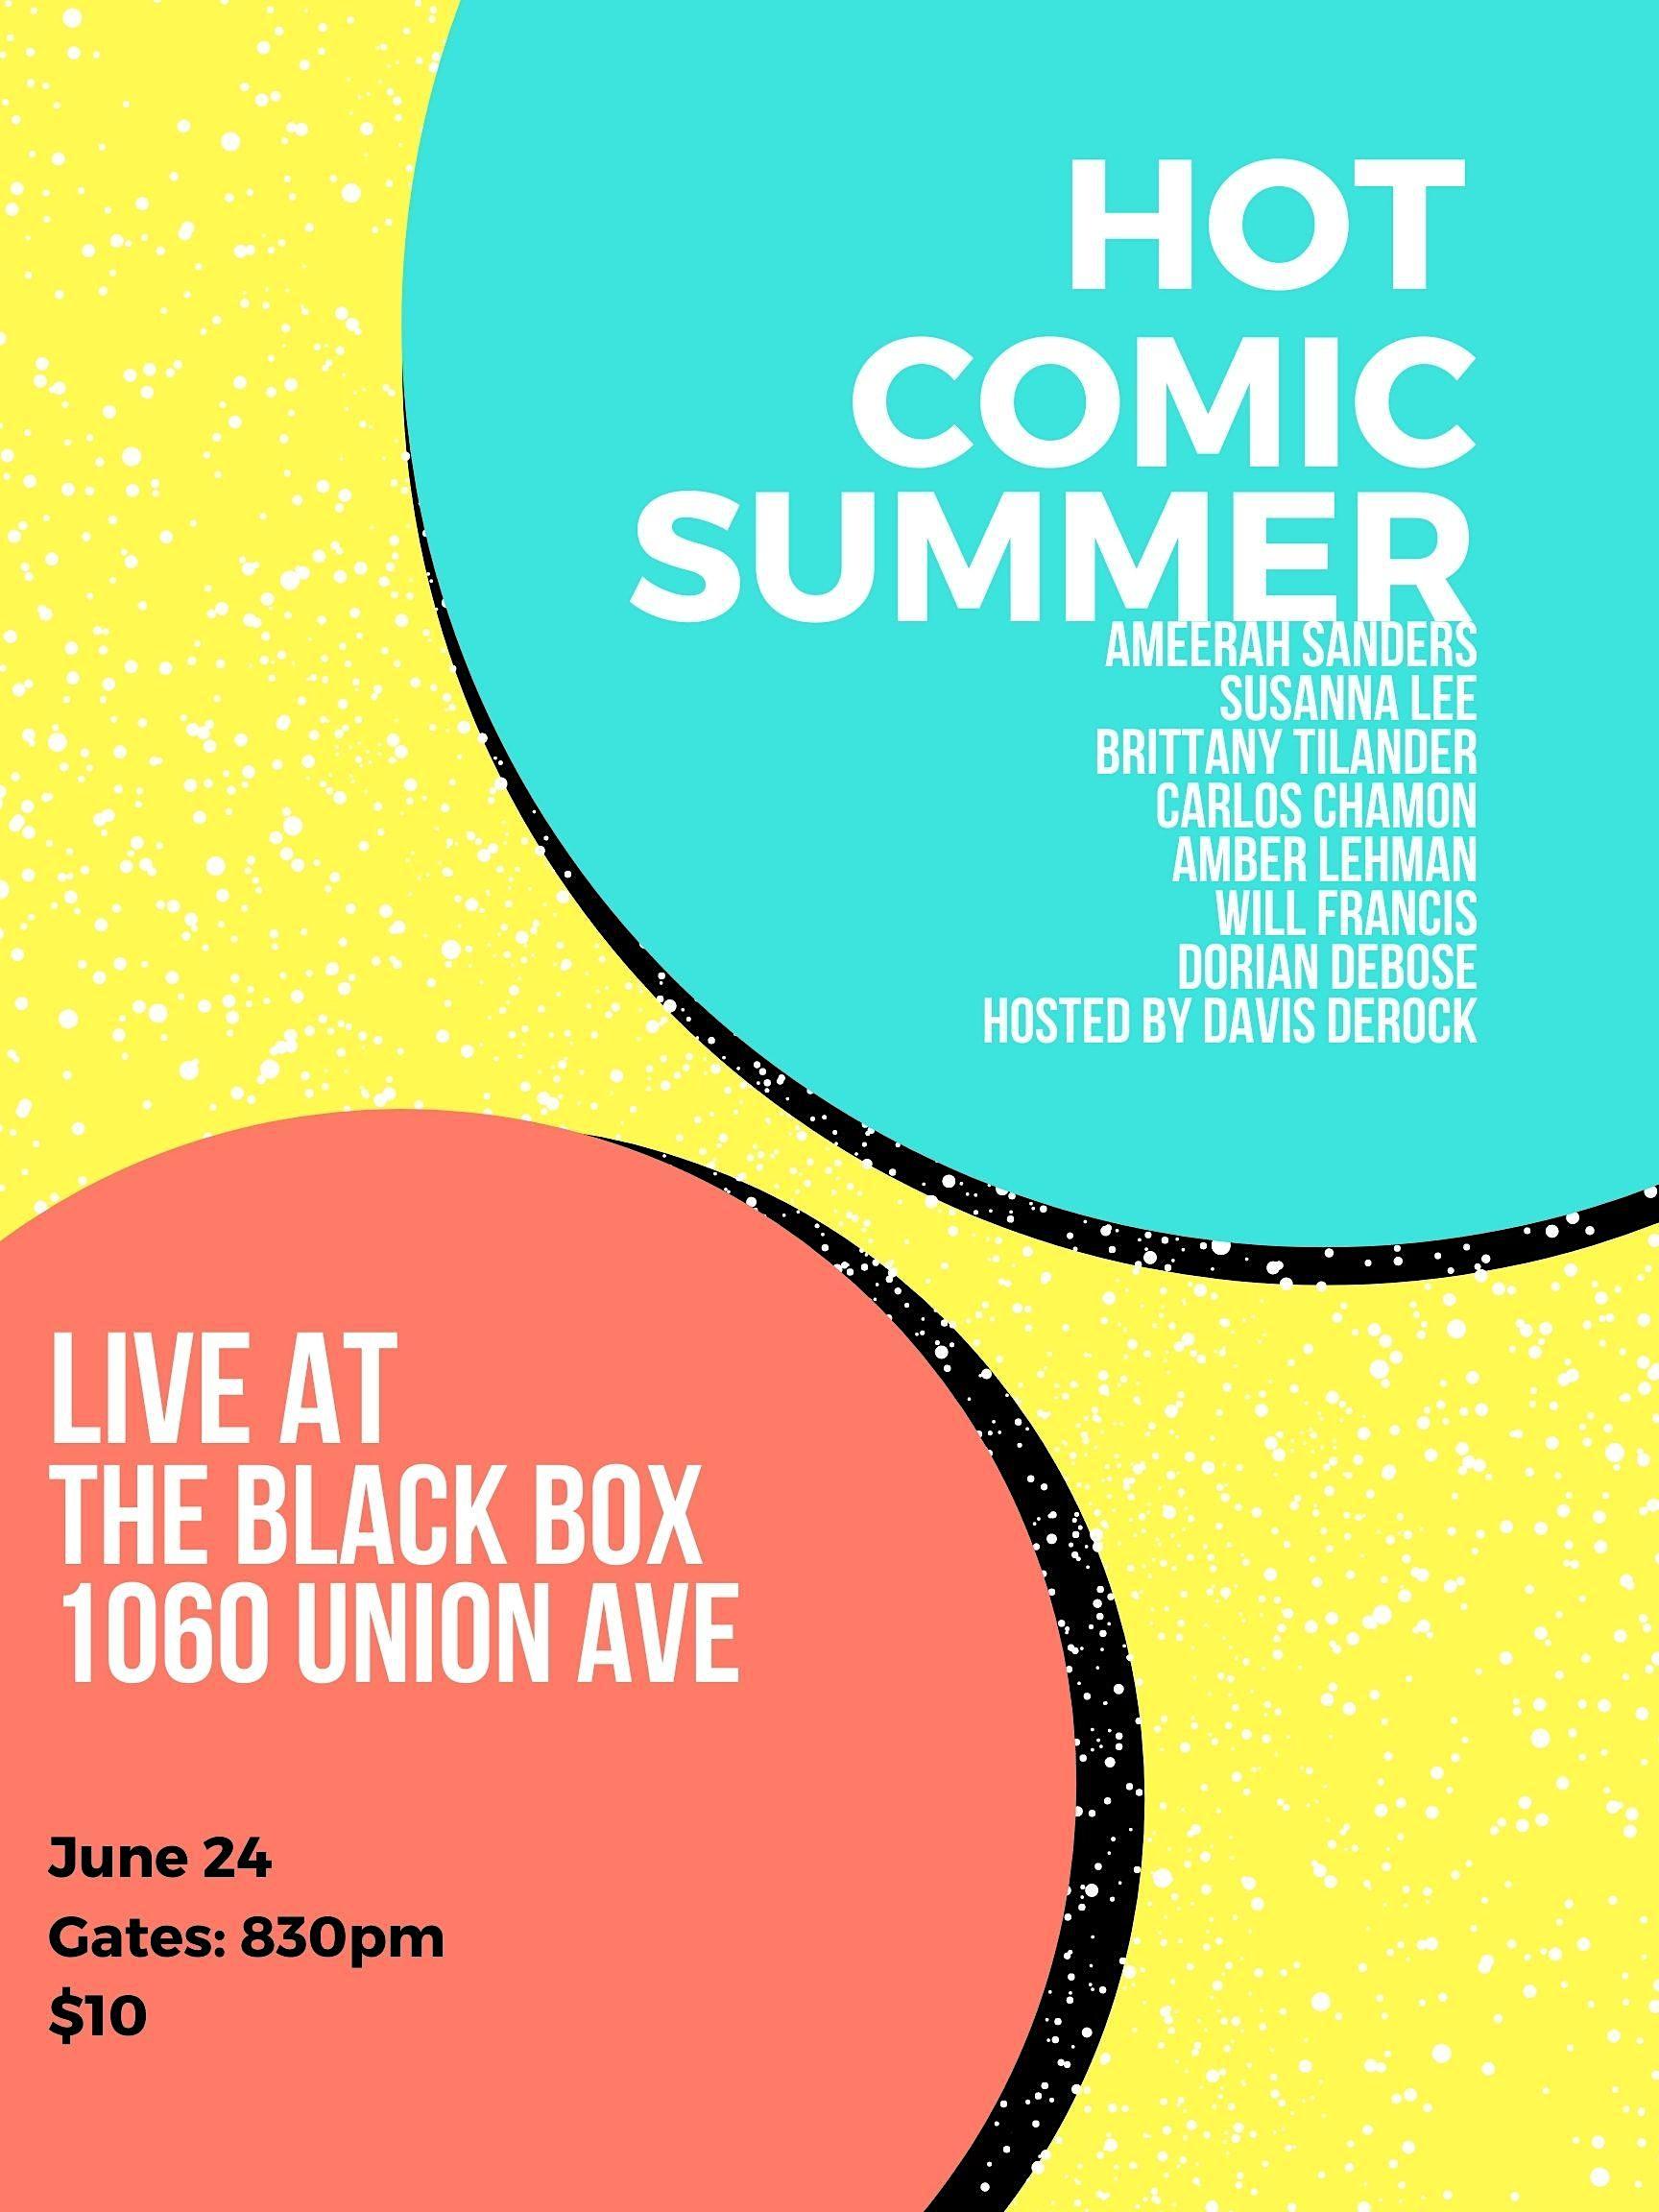 THU, JUN 24 - Hot Comic Summer